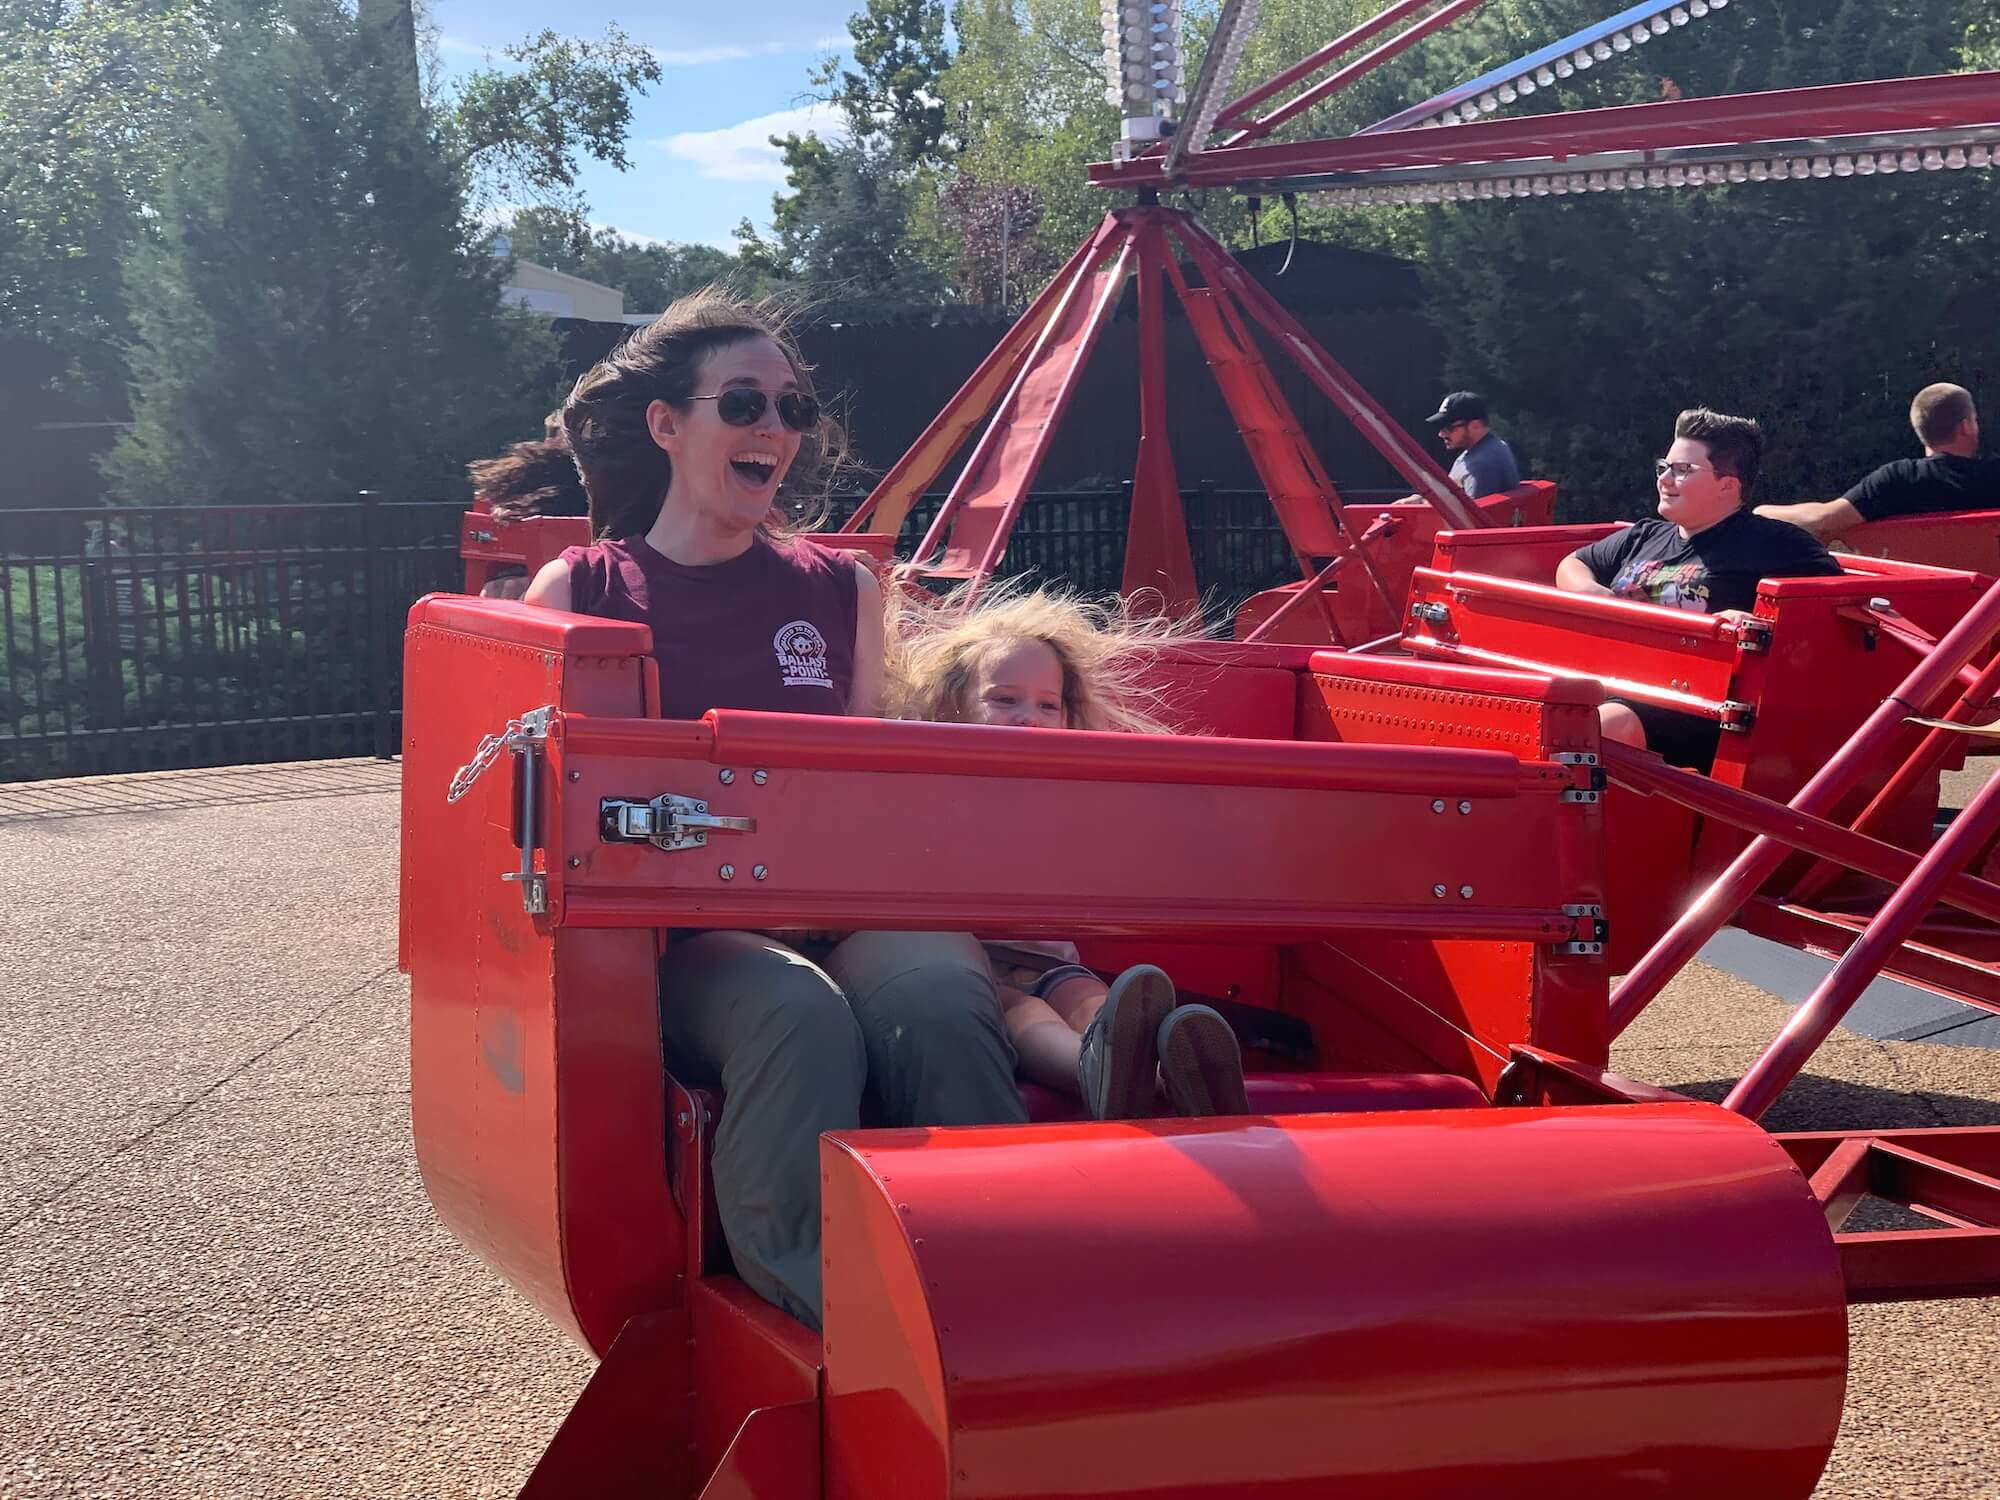 My daughter and I riding a scrambler amusement park ride